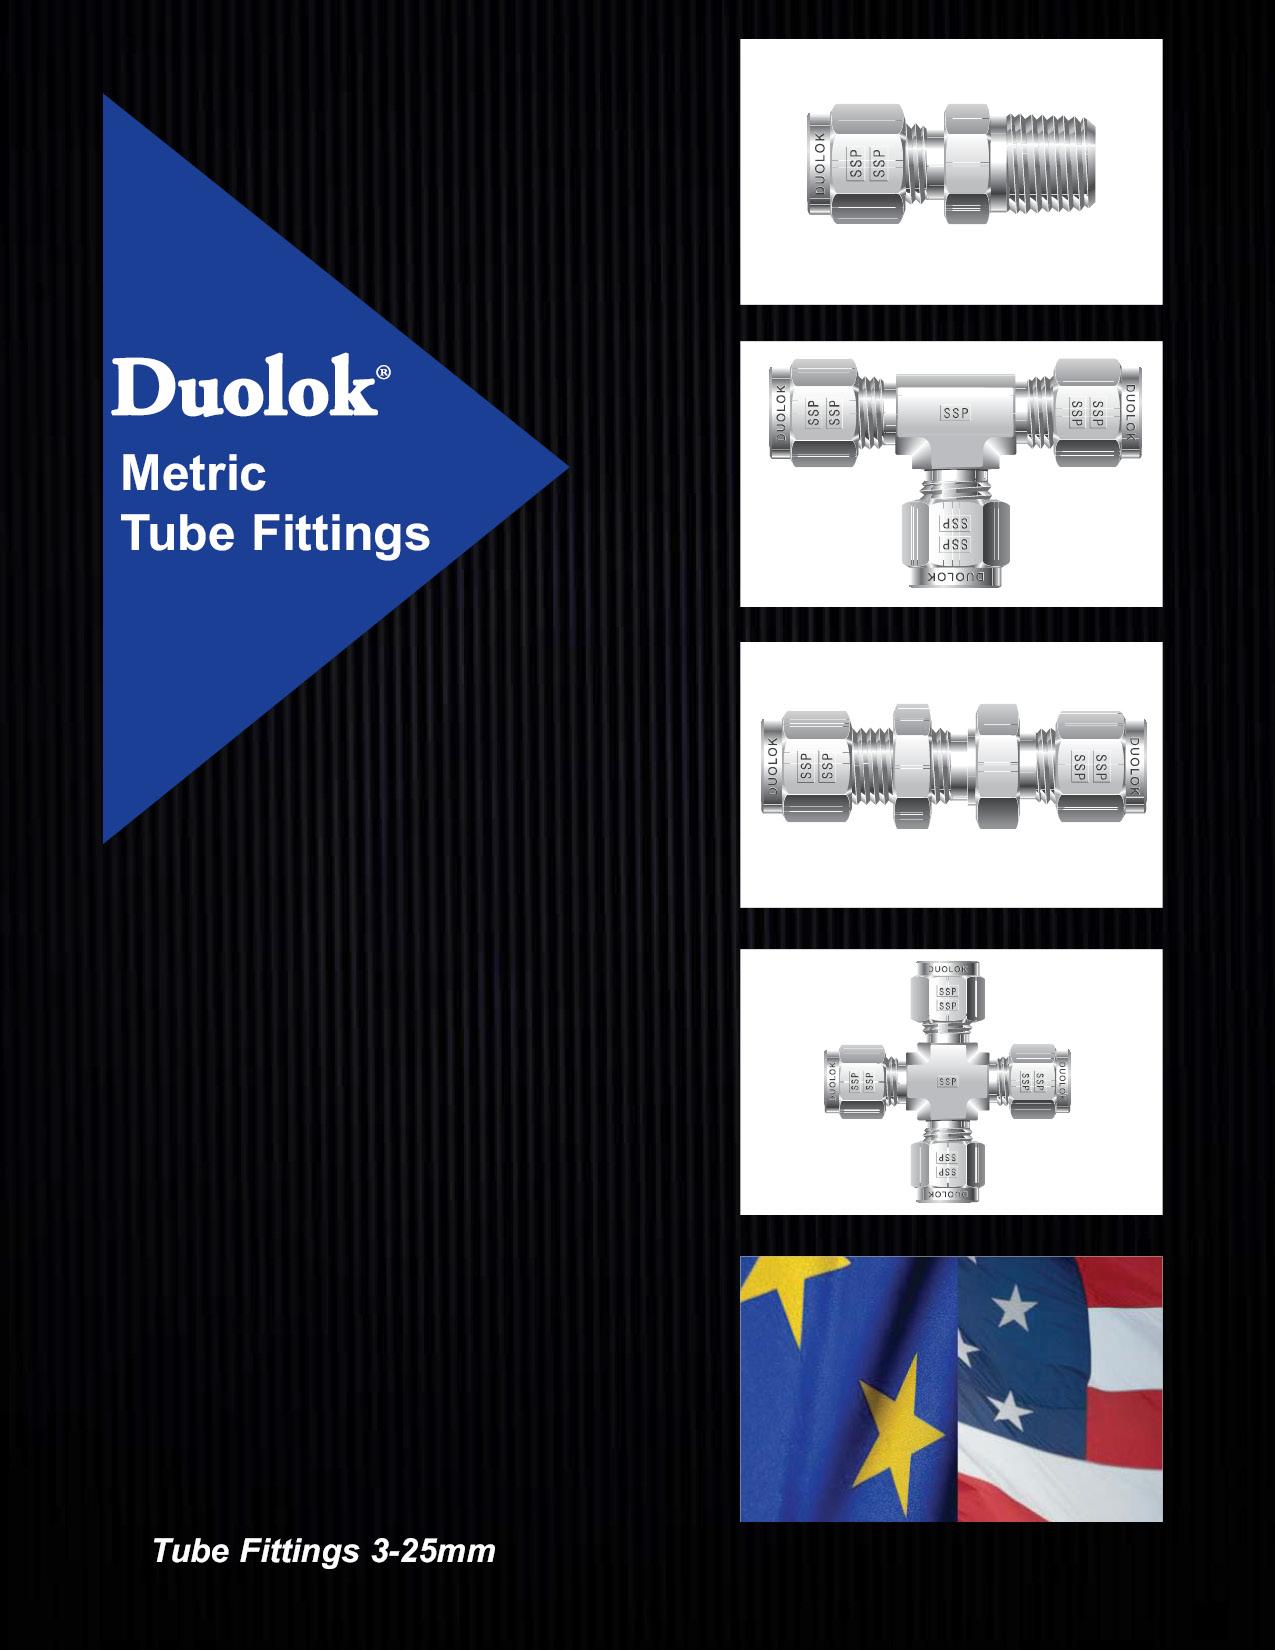 Duolok Metric Catalog Cover Image